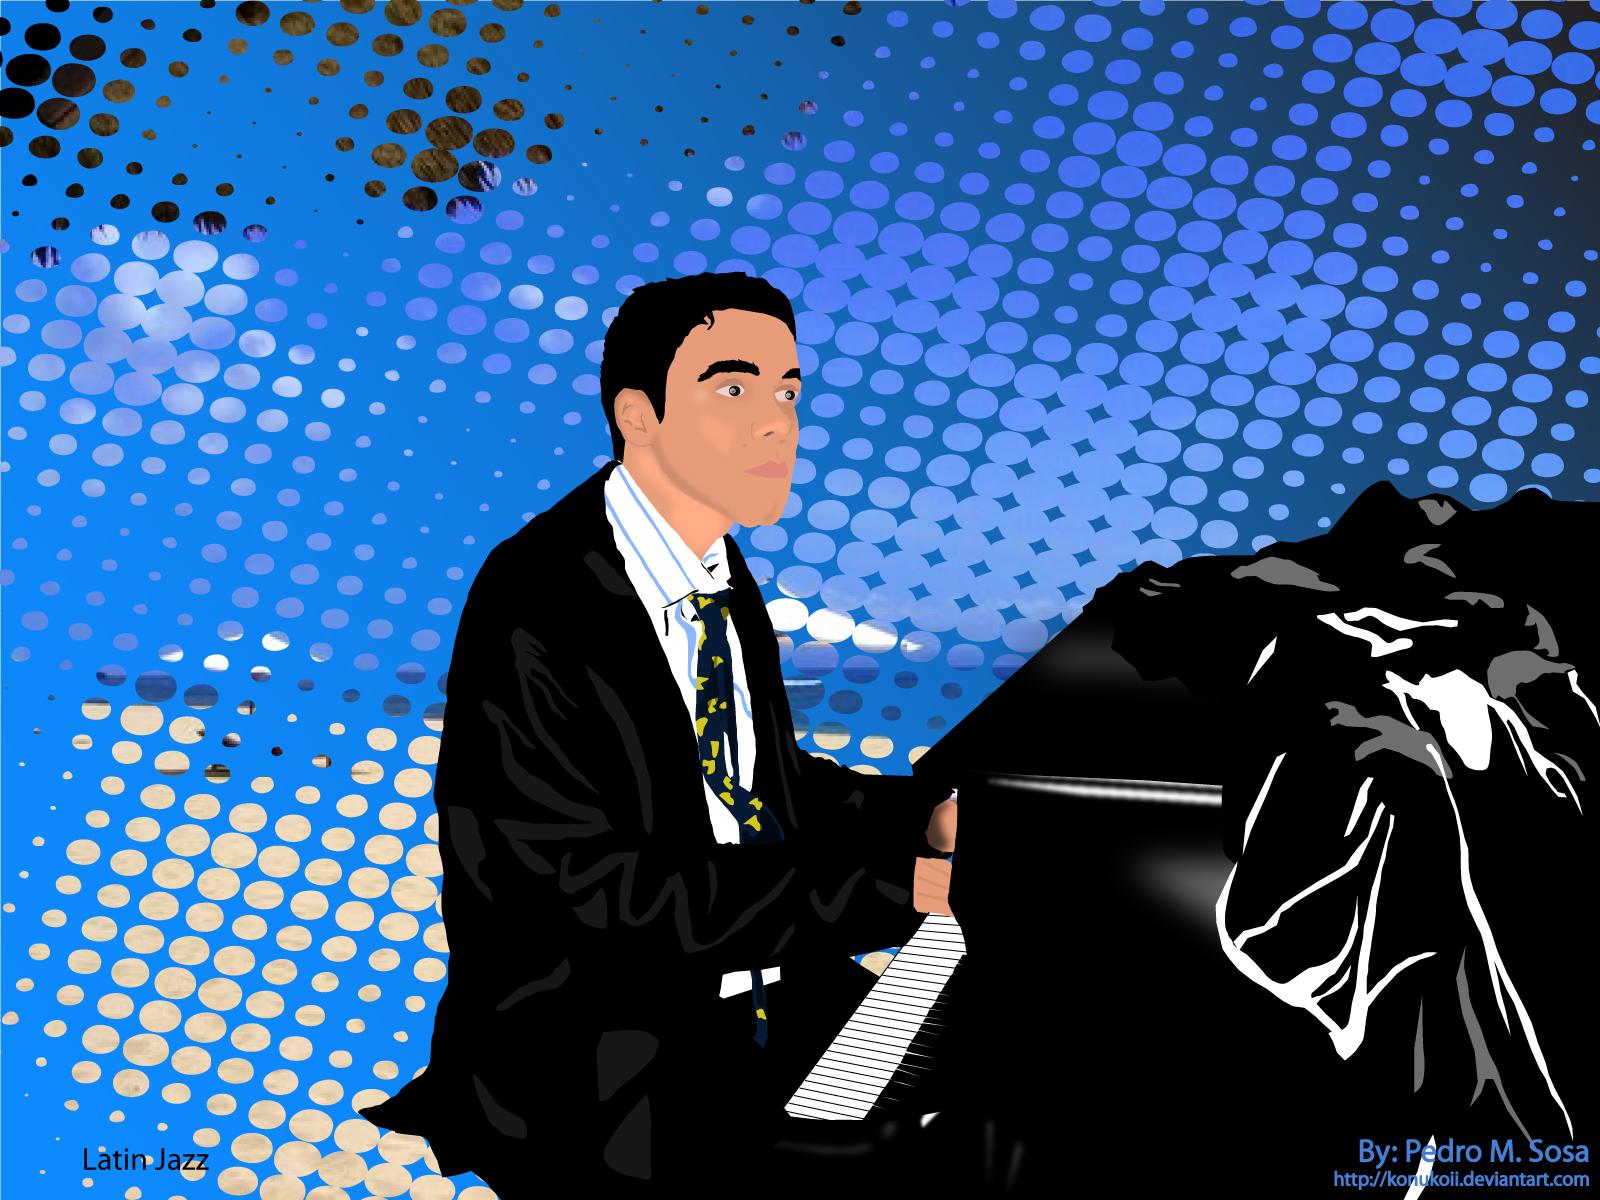 Latin Jazz by konukoii